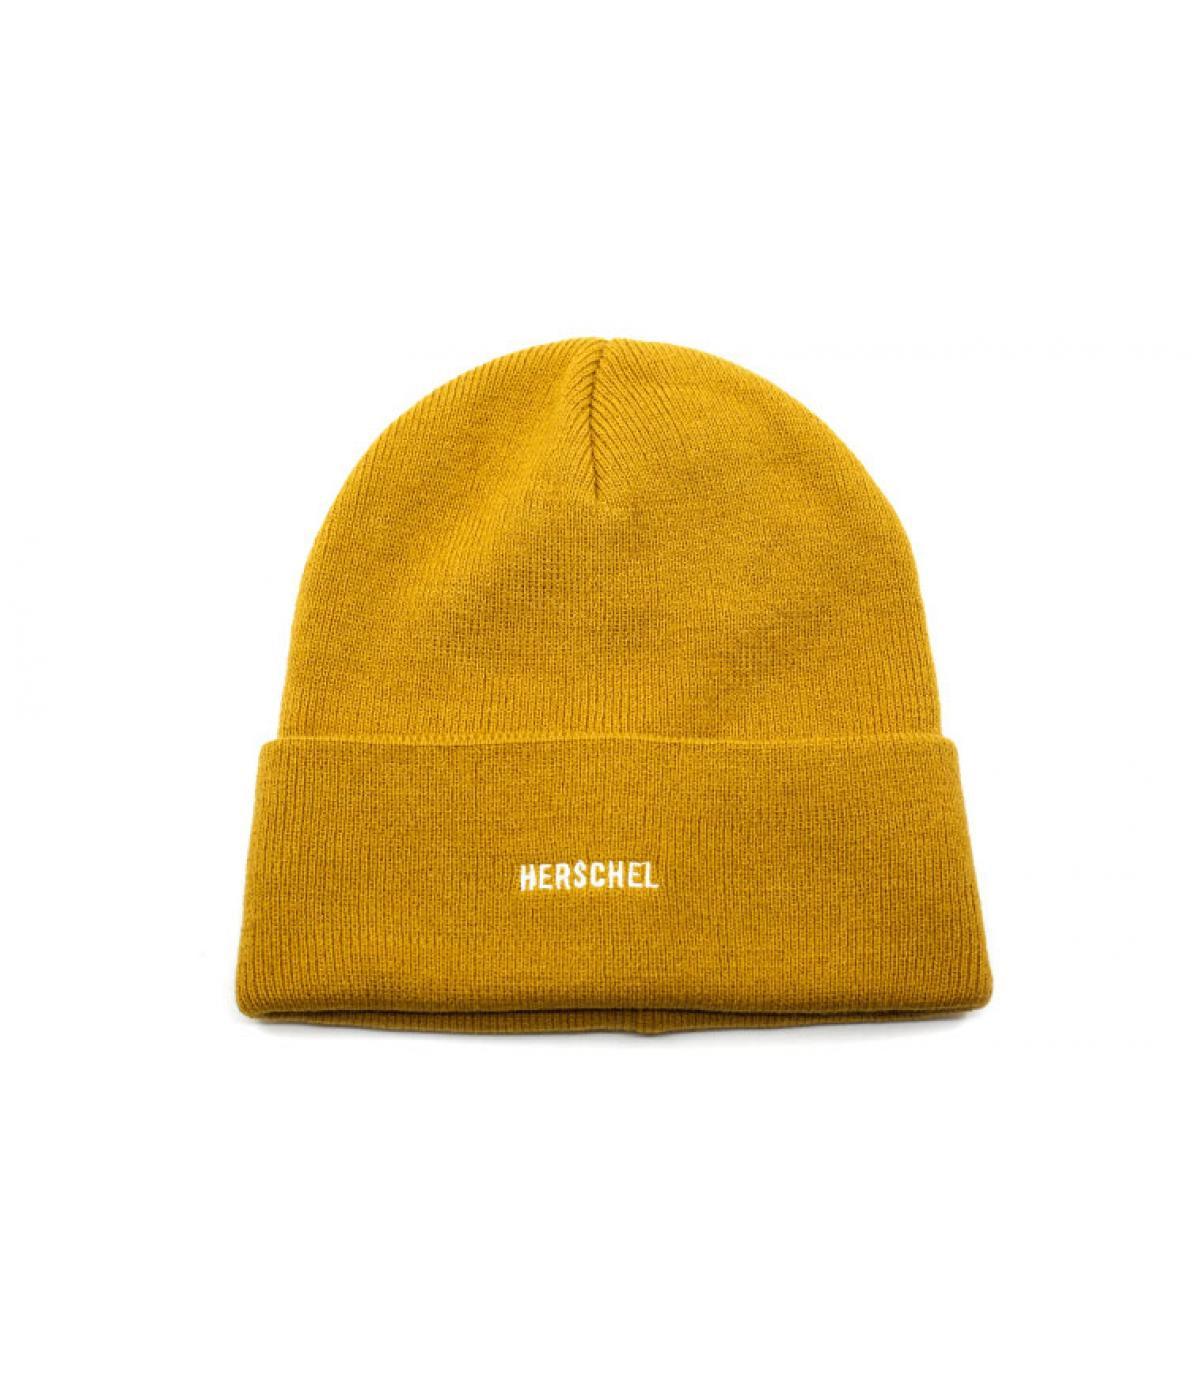 bonnet revers moutarde Herschel